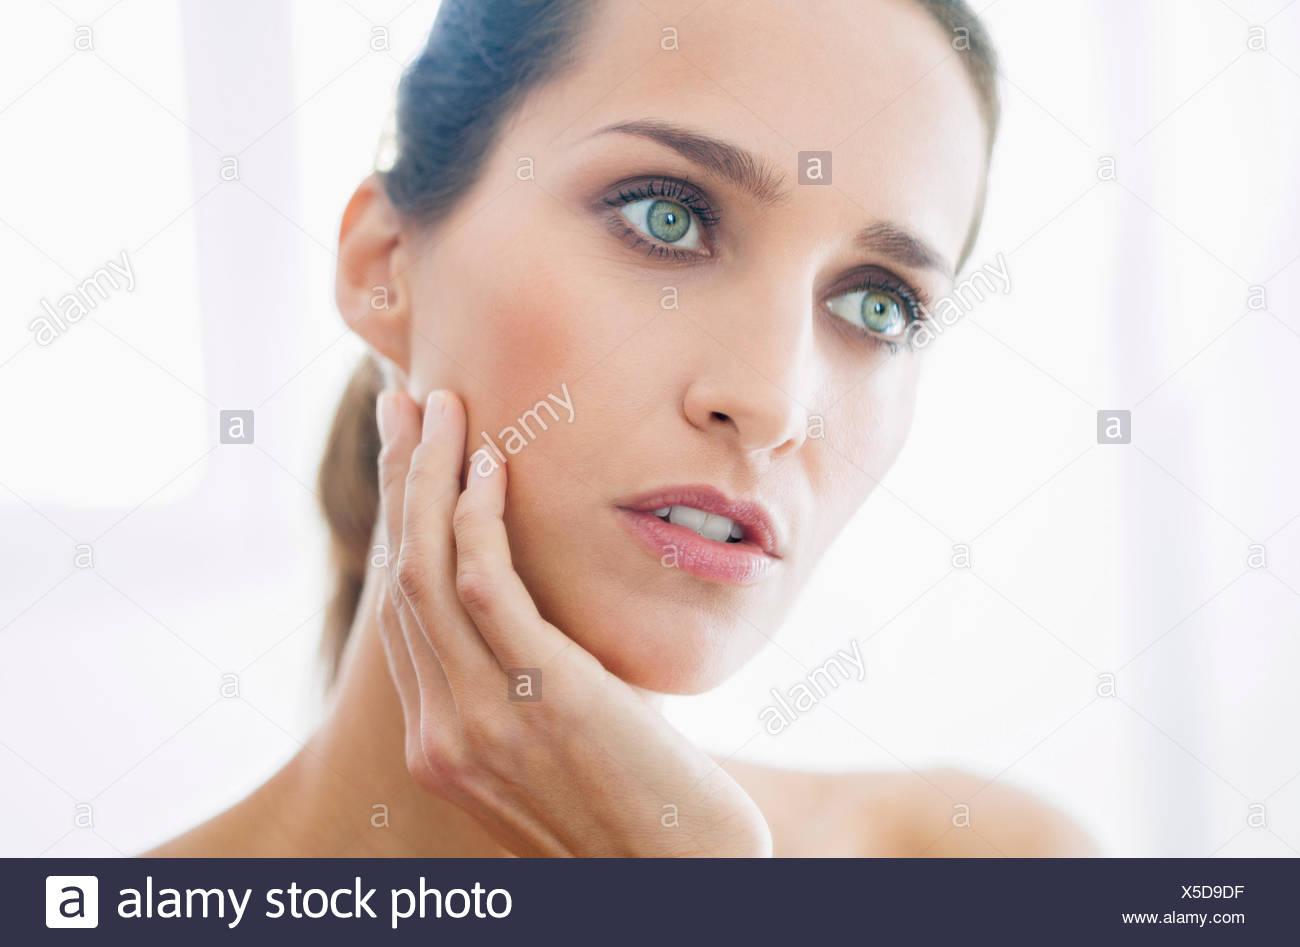 Close-up of a Beautiful woman looking away Photo Stock